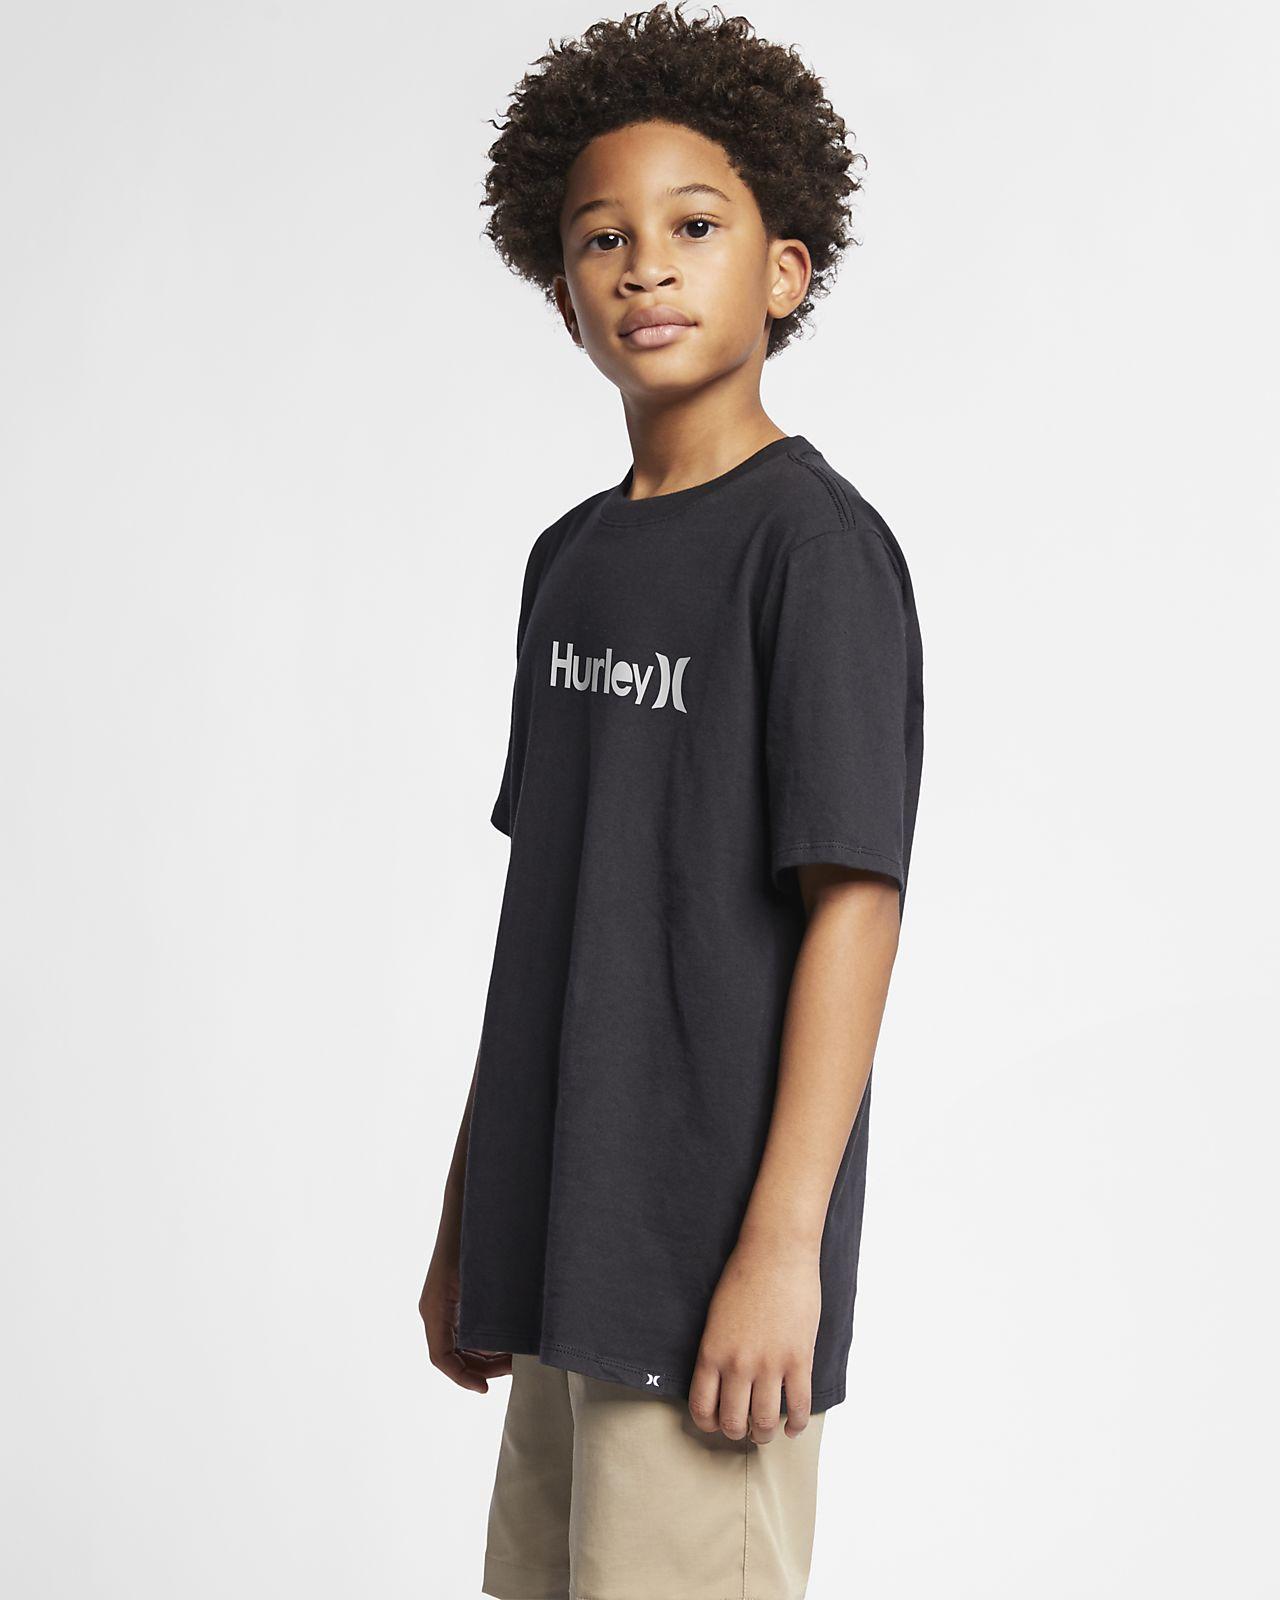 T-shirt Hurley Premium One And Only Solid för killar